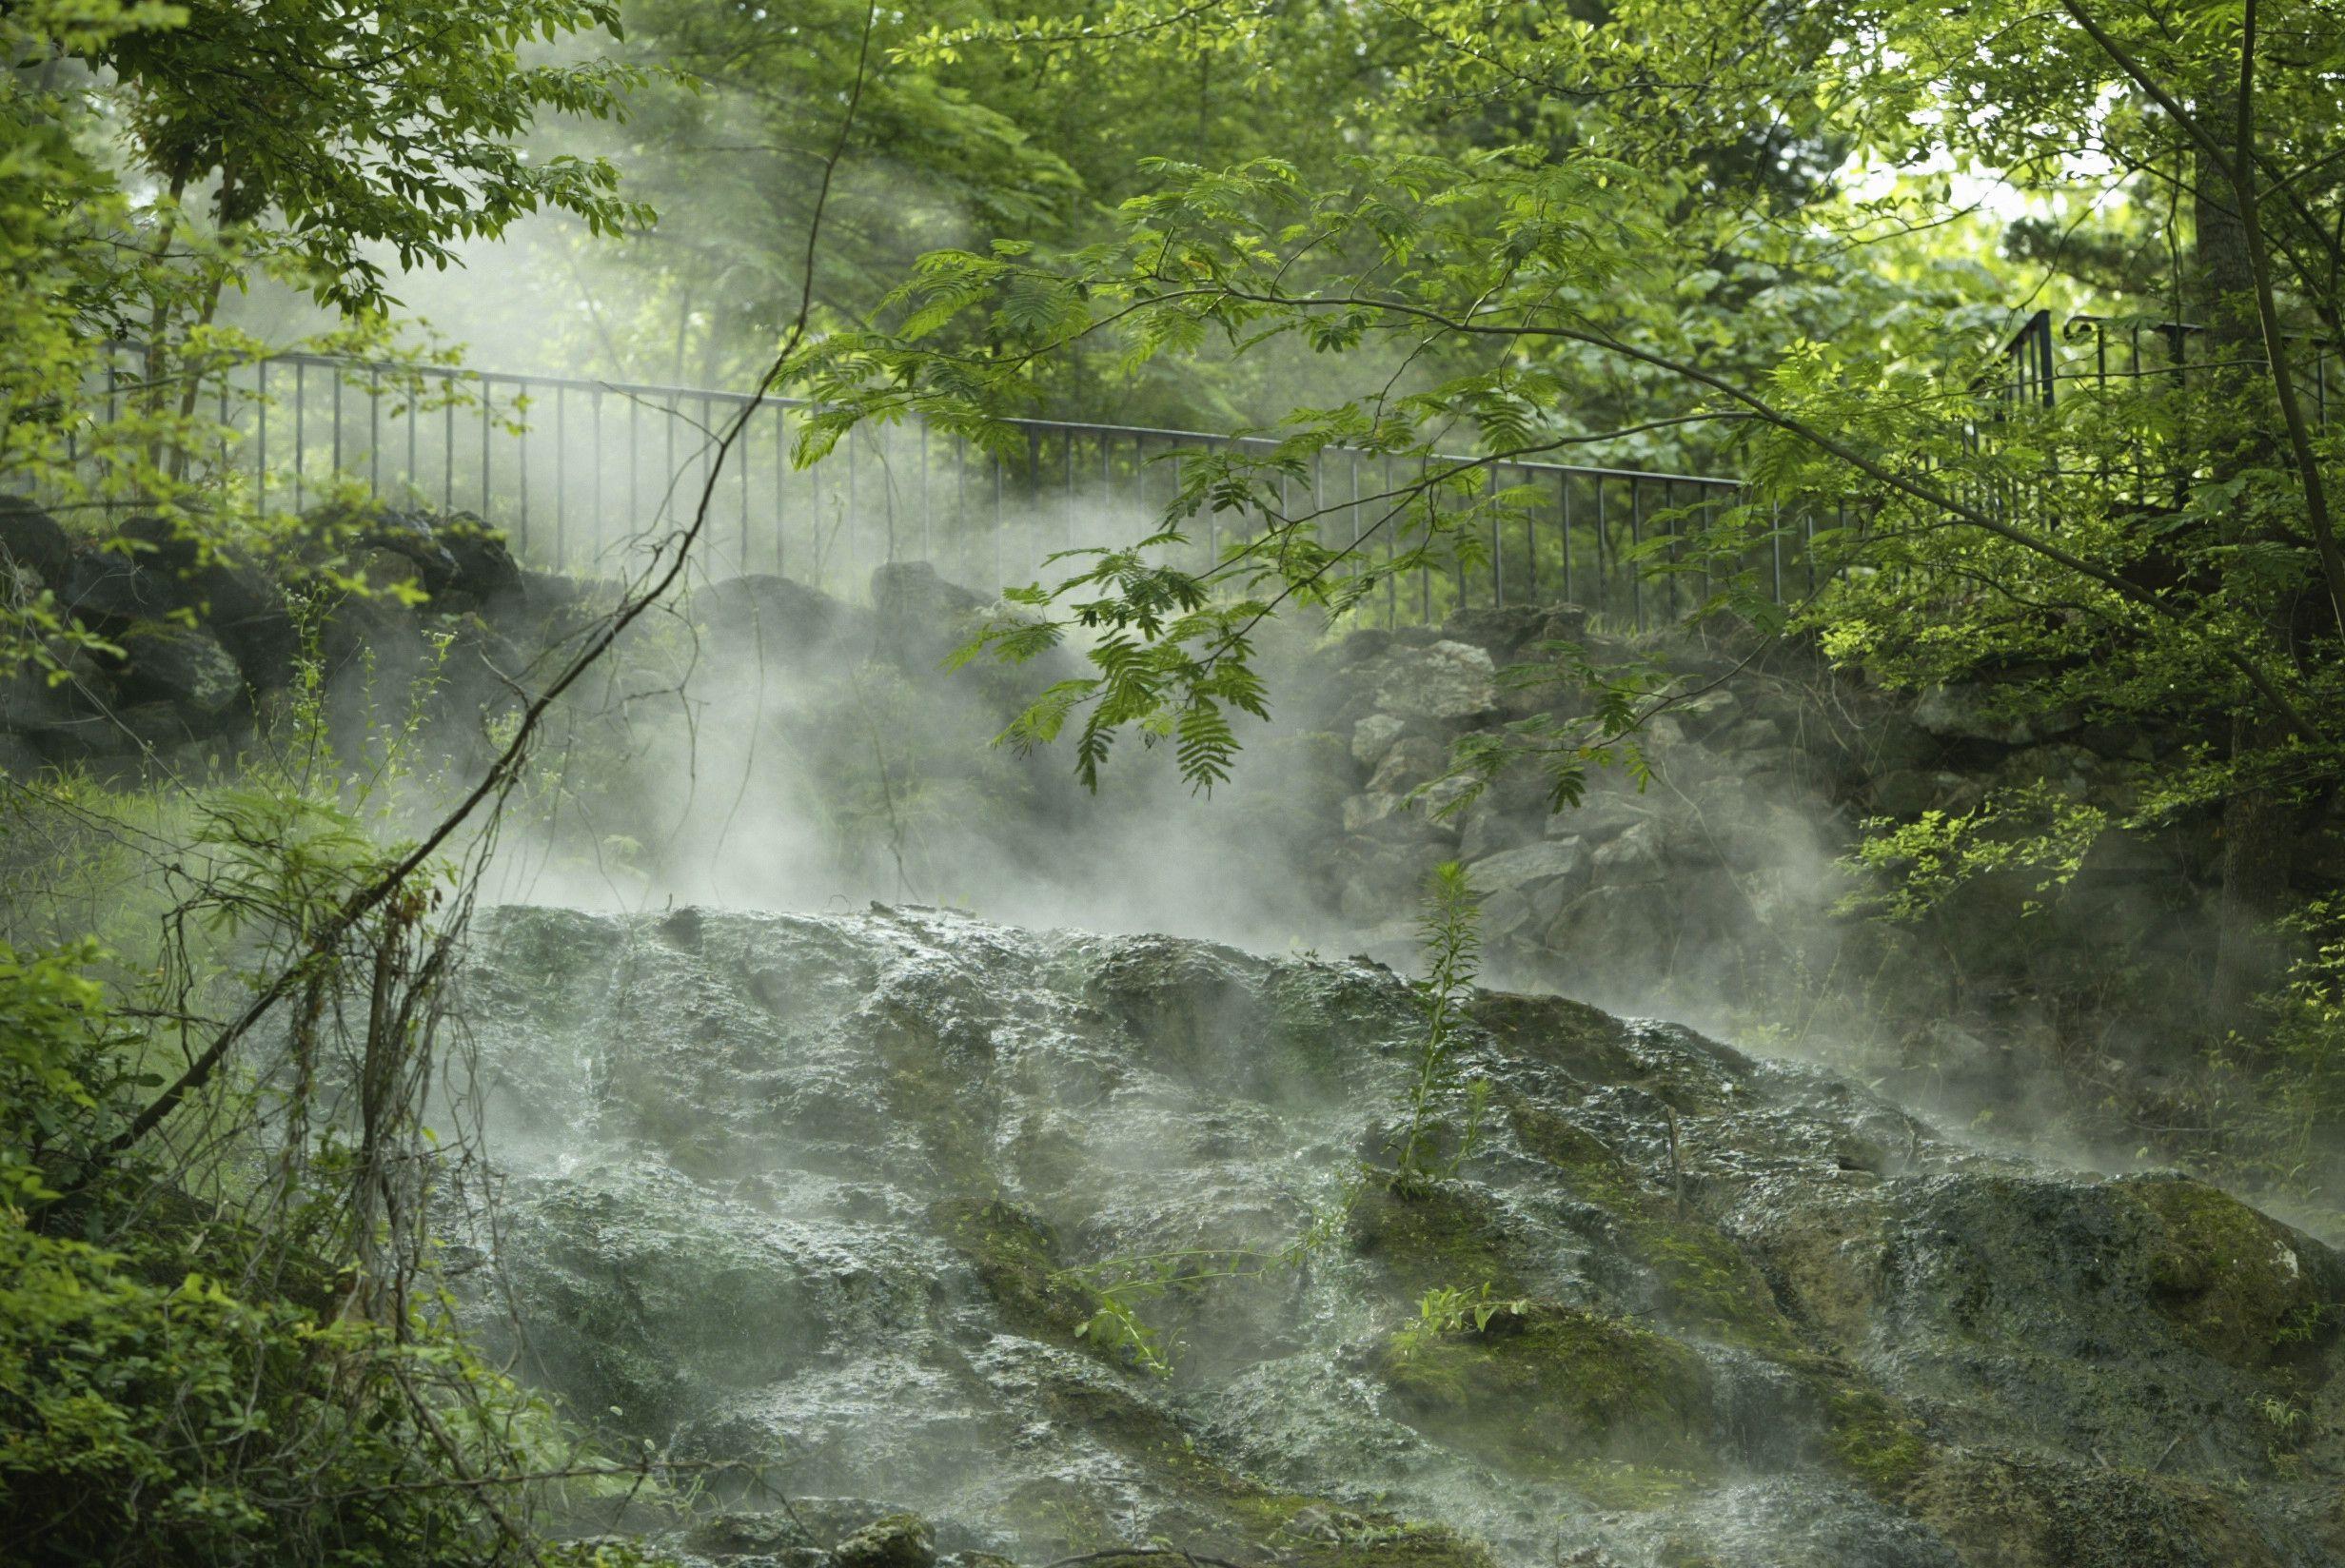 Arkansas, Hot Springs, steam rises from a hot spring at Arlington Lawn in Hot Springs National Park.